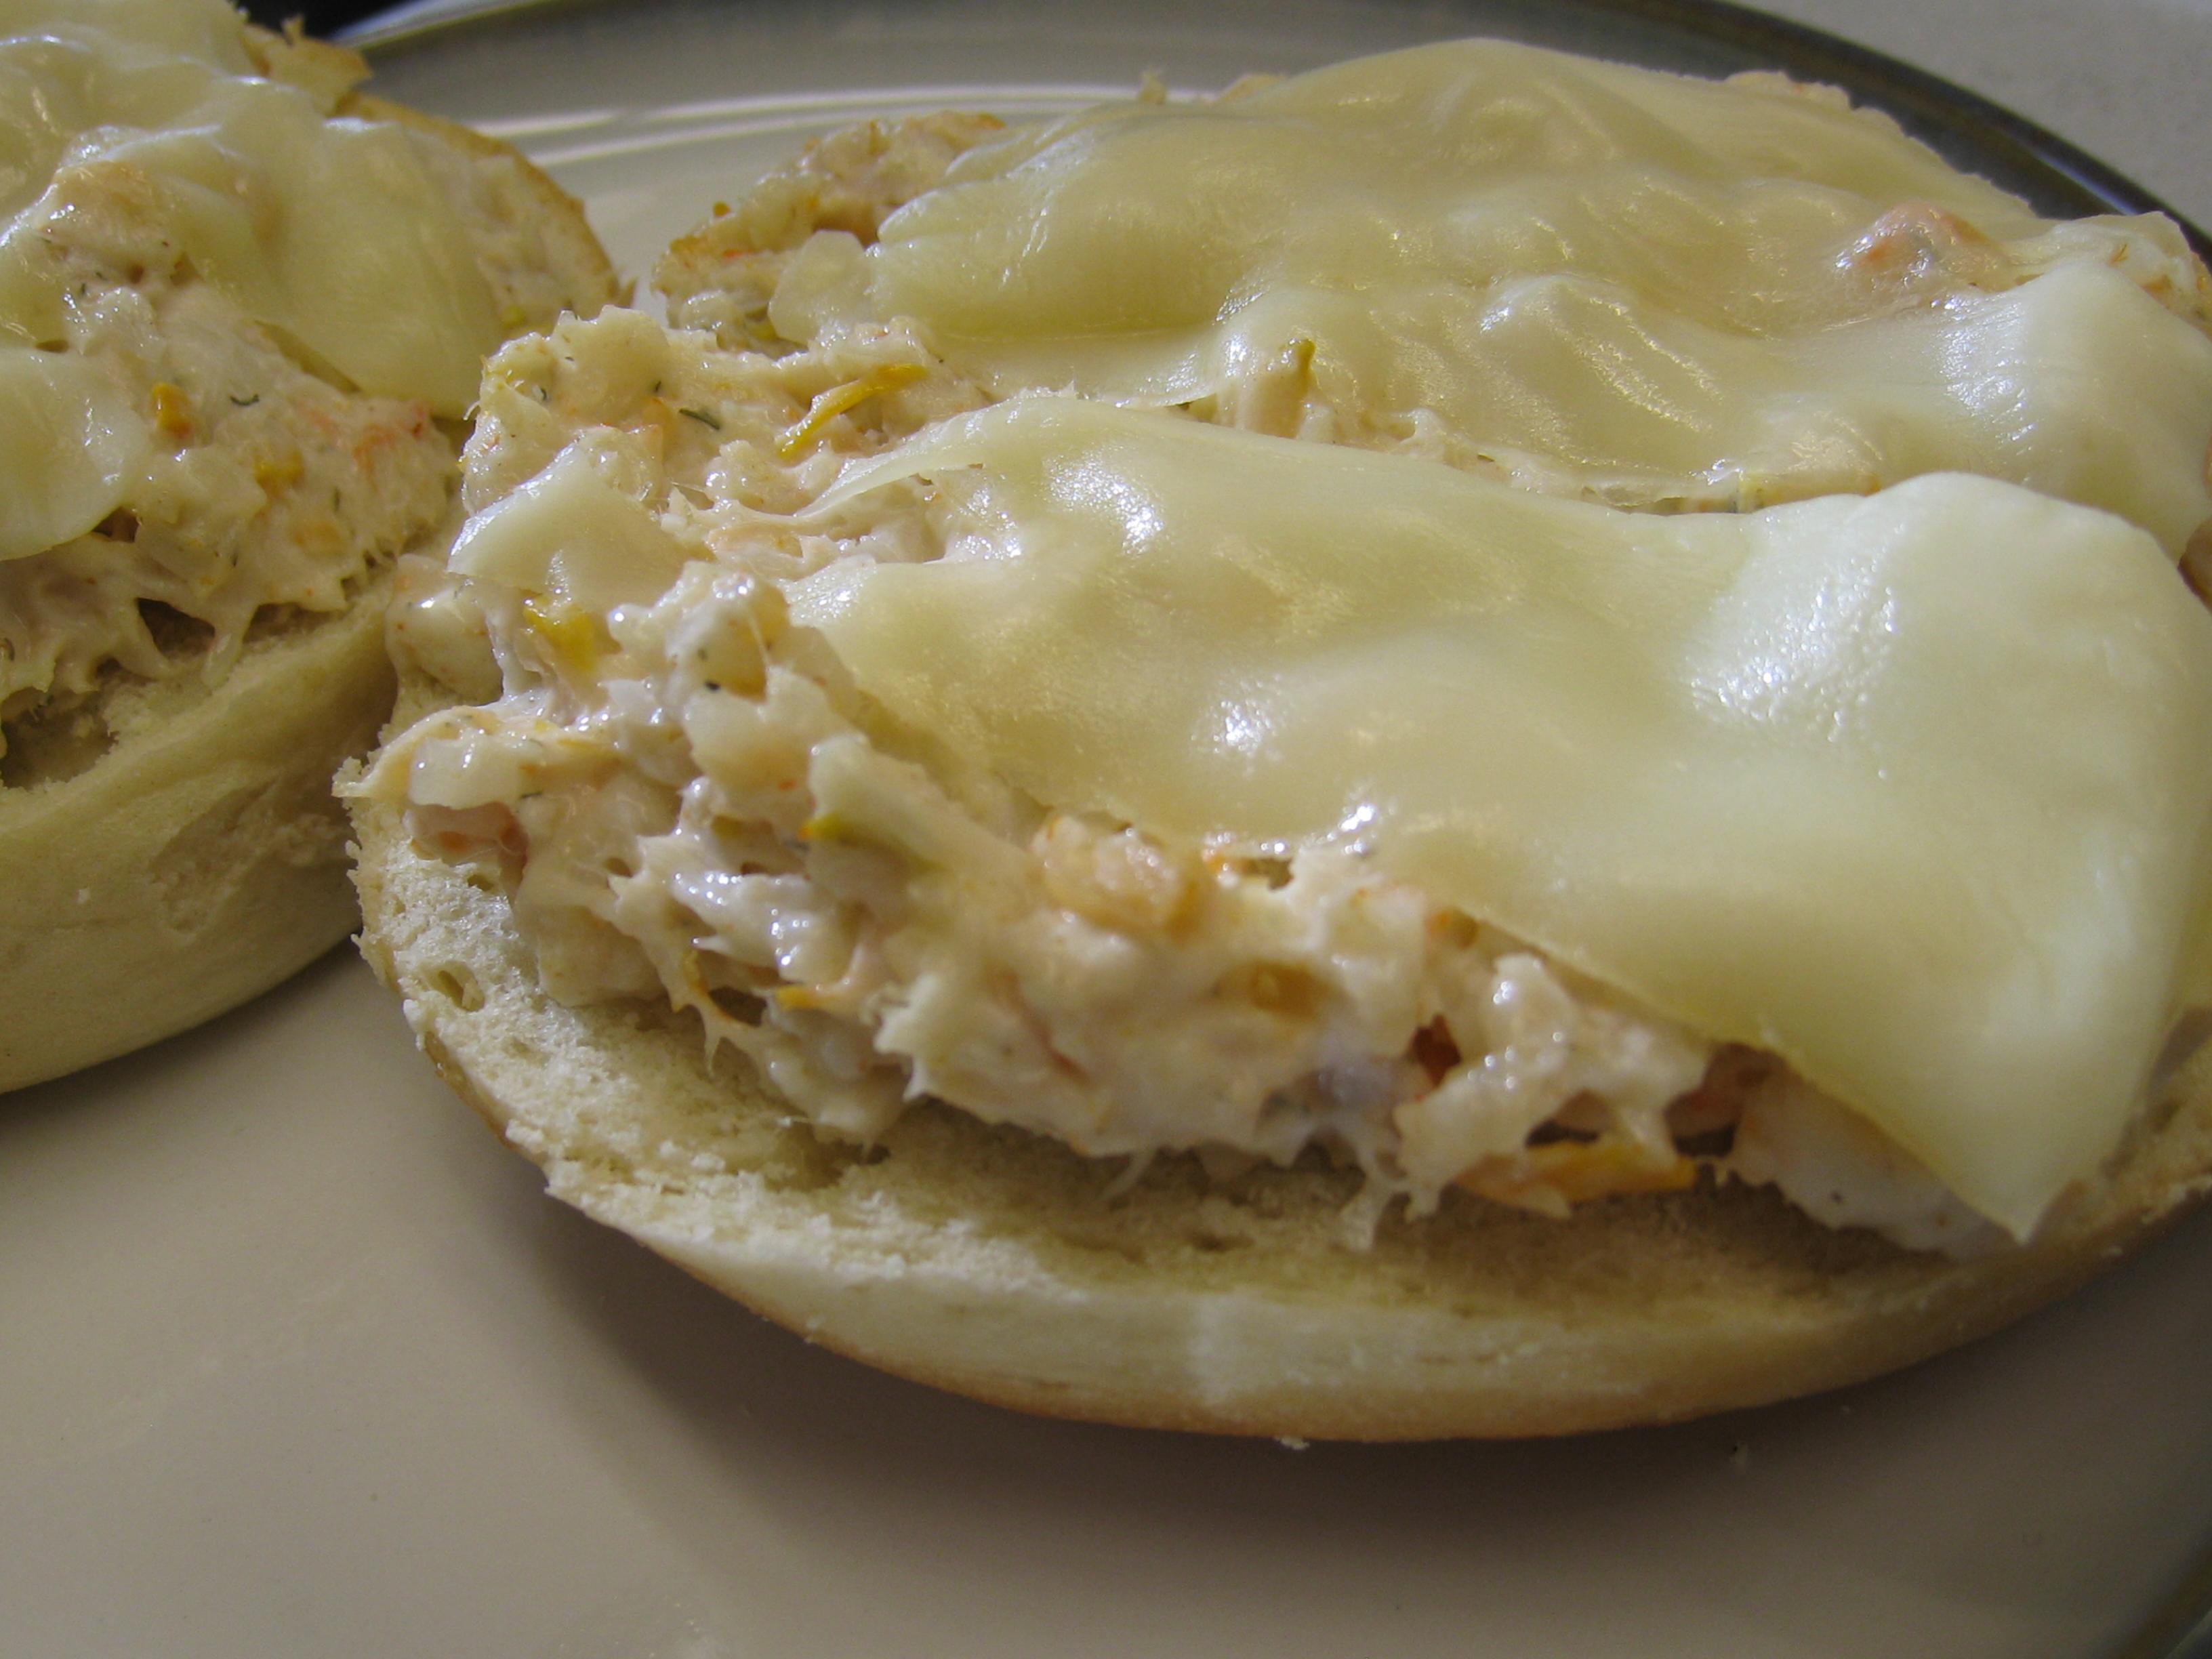 food punk » The Sandwich Series: Shrimp salad melt bagel